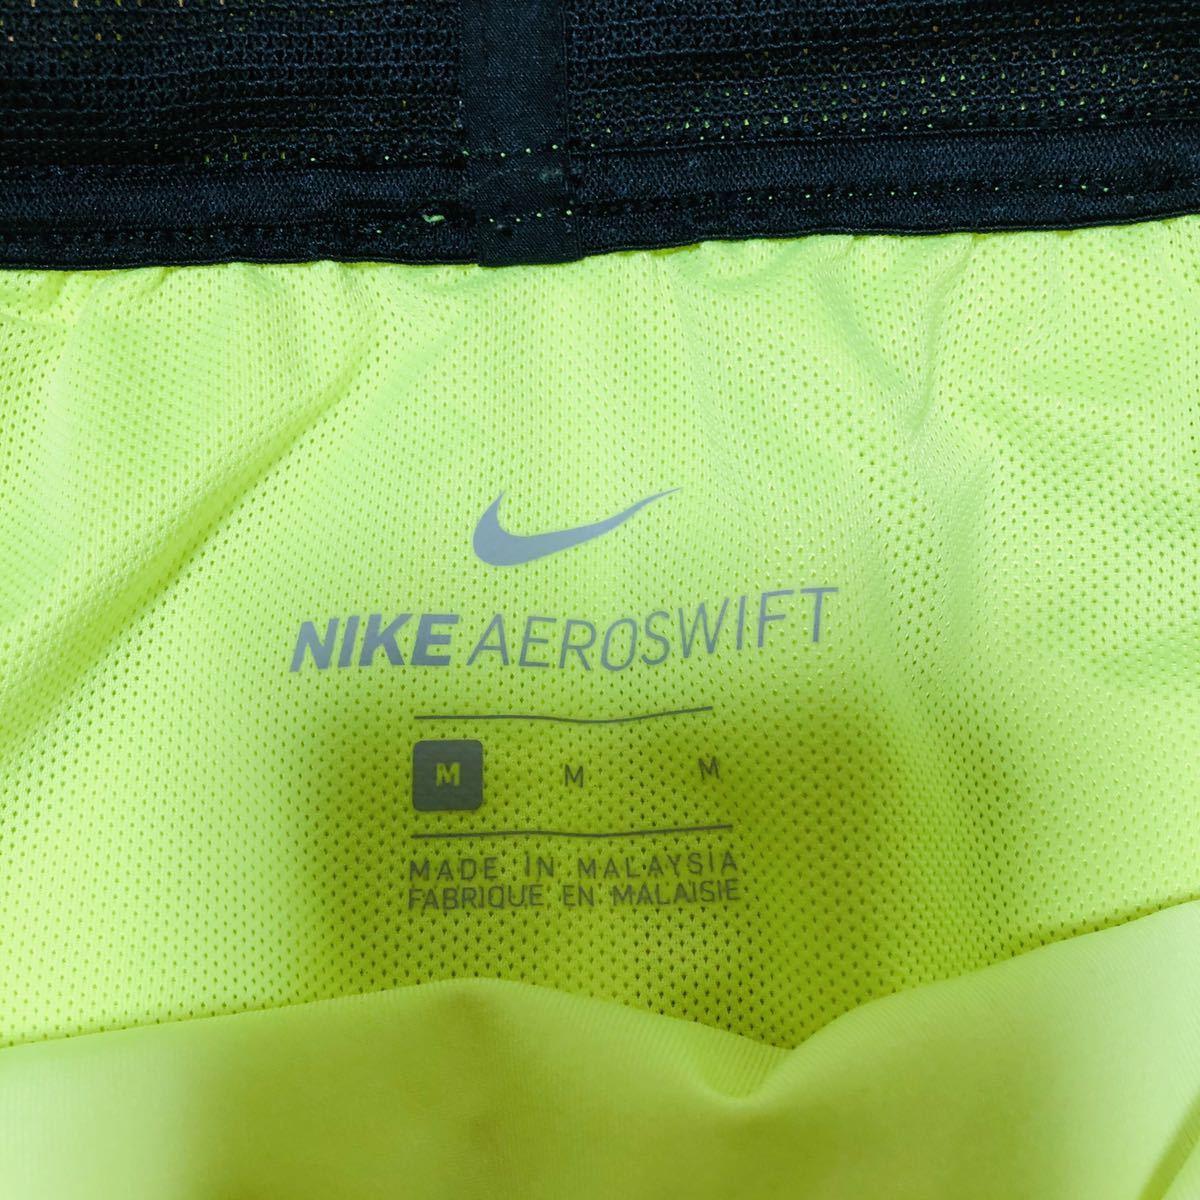 NIKE ランニングパンツ ショートパンツ ランニング ナイキ エアロスイフト AEROSWIFT ボルト M ランパン 中古